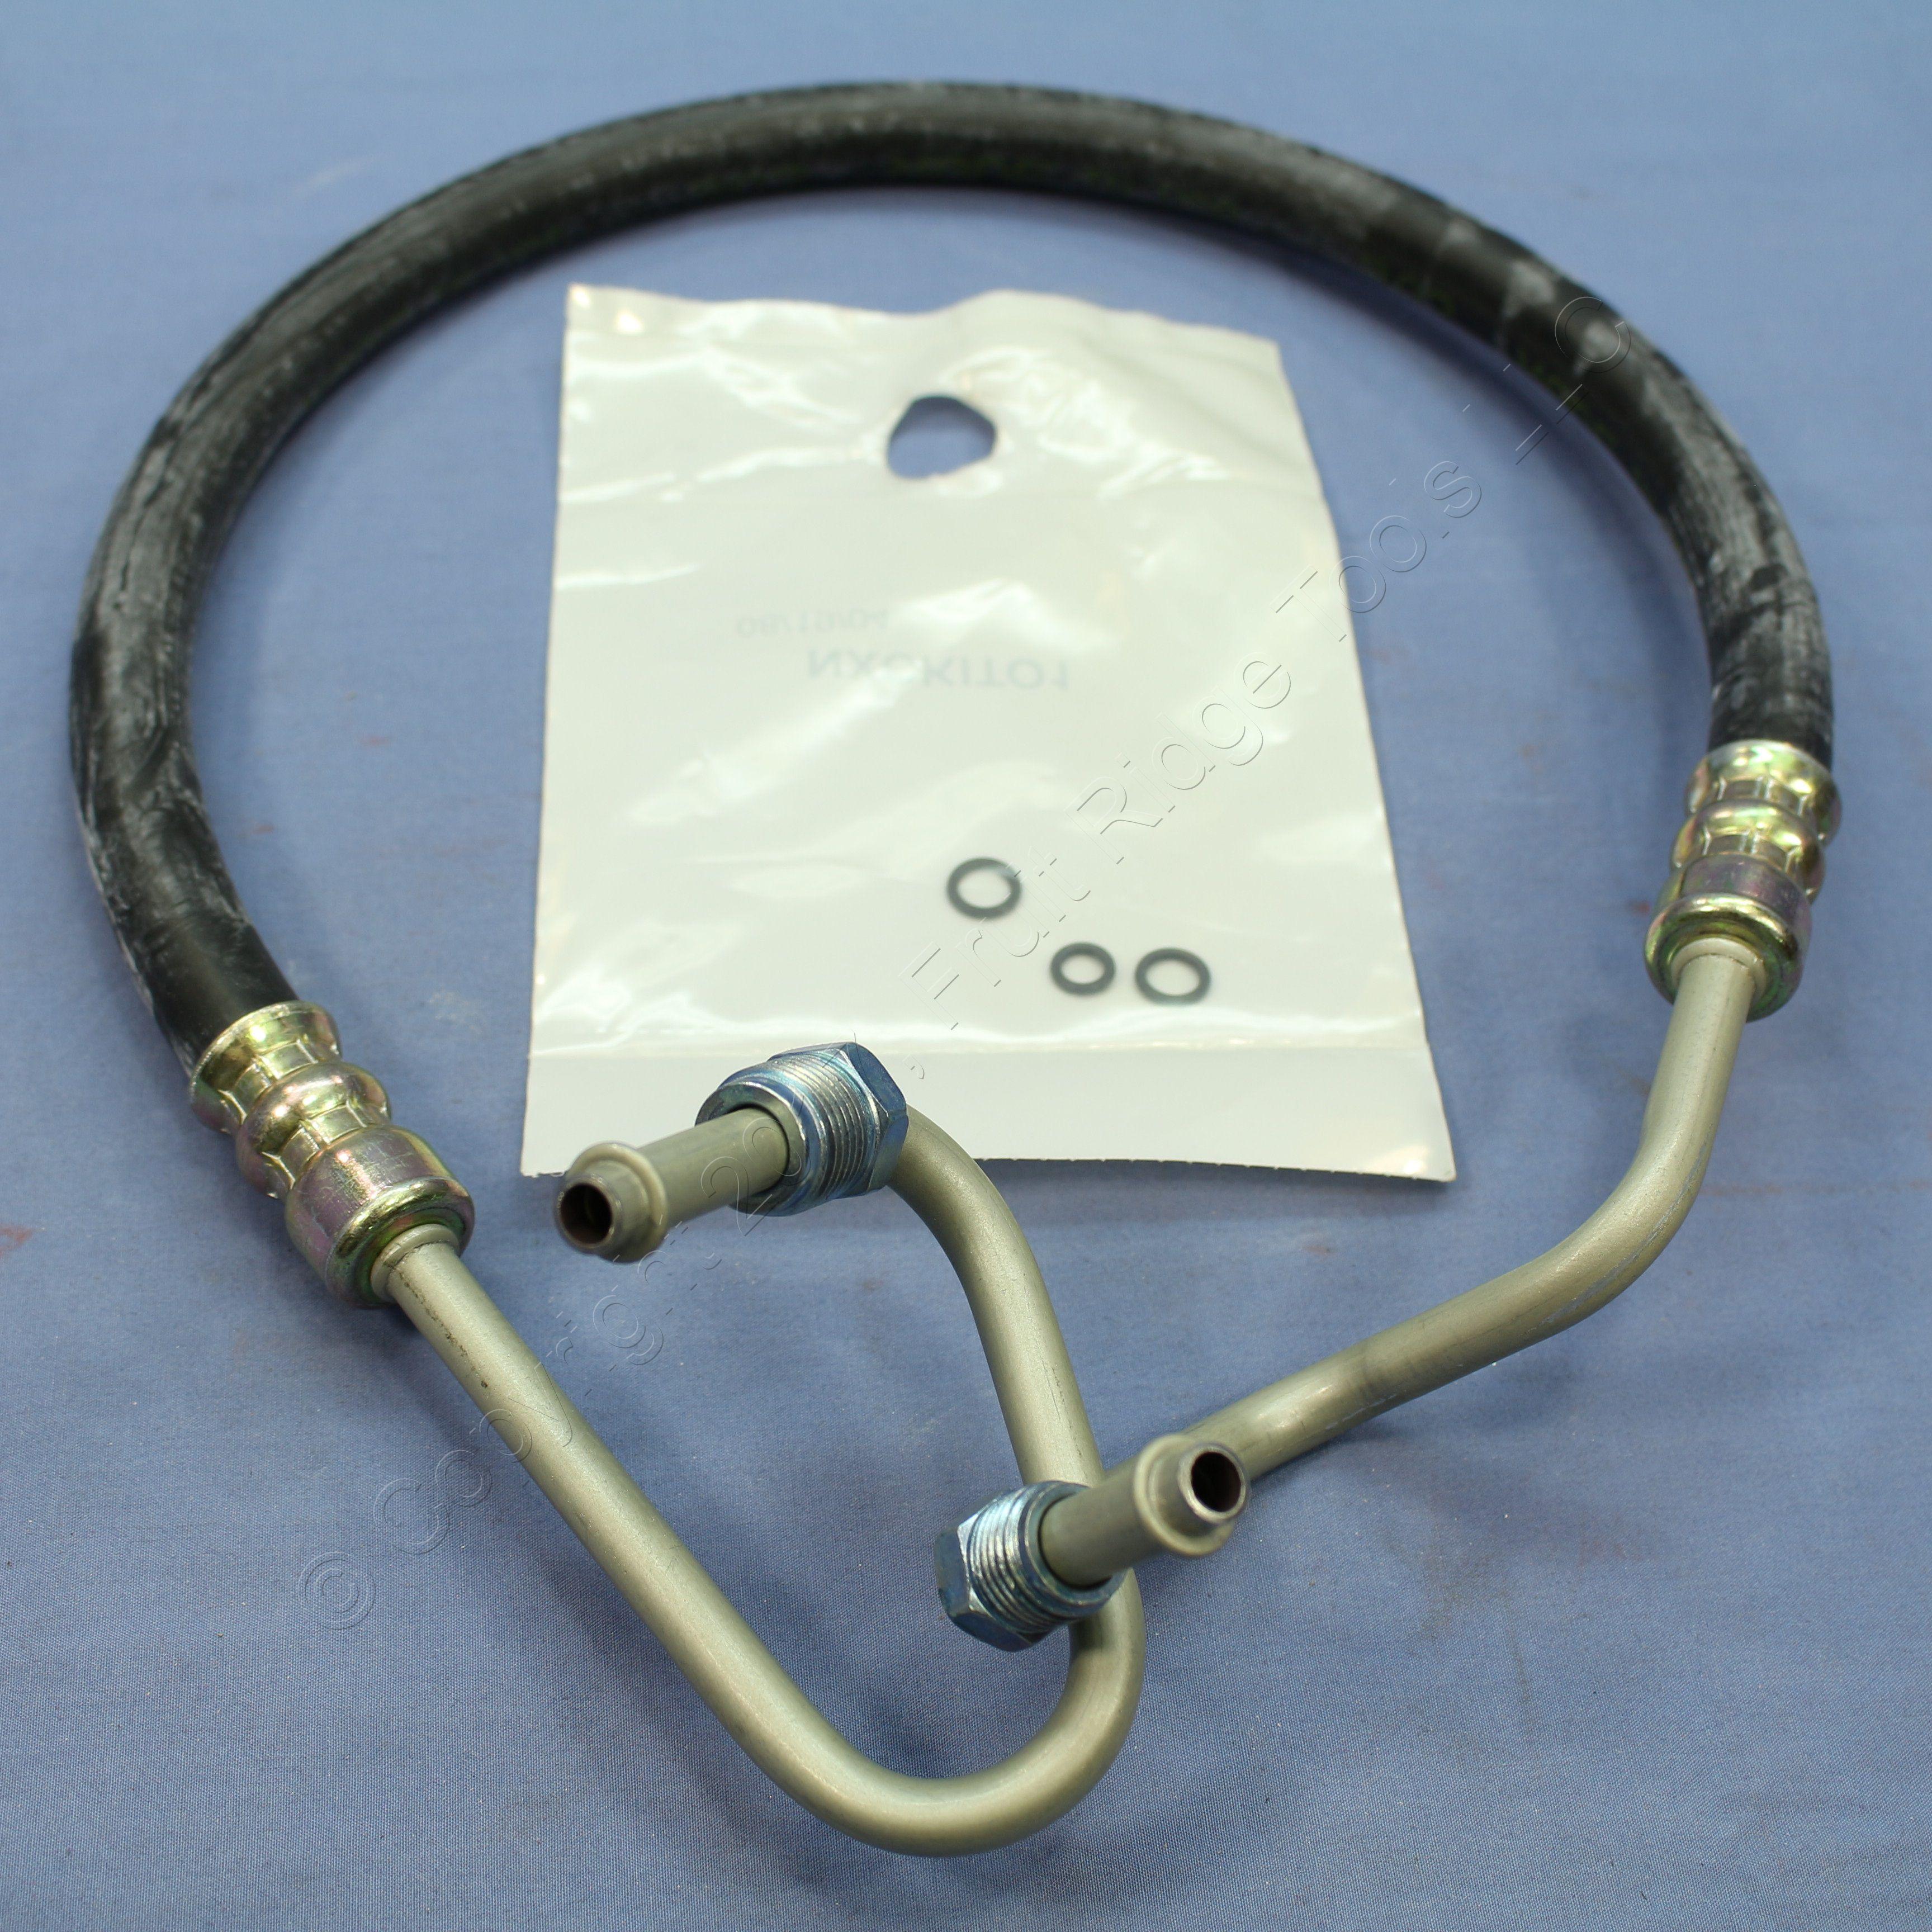 For 1994-2001 Dodge Ram 1500 Power Steering Pressure Line Hose Assembly 31225BV